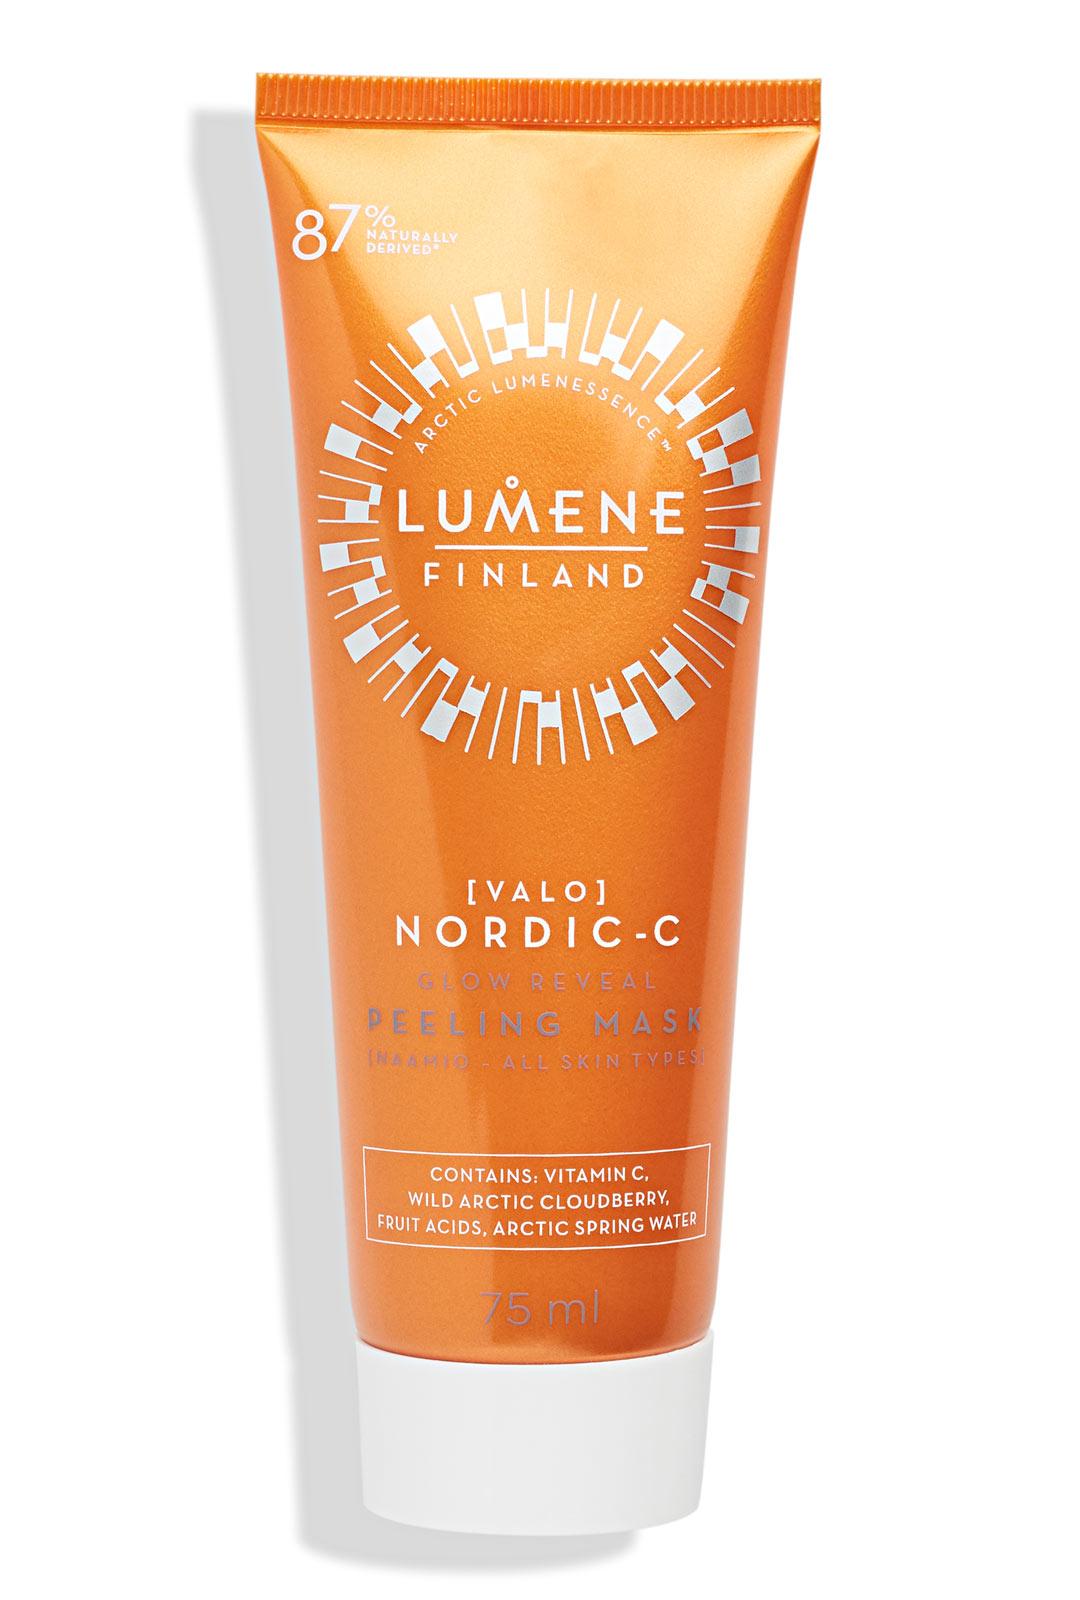 Lumene Valo Nordic-C Glow Reveal Peeling Mask, 14,90 €/75 ml.